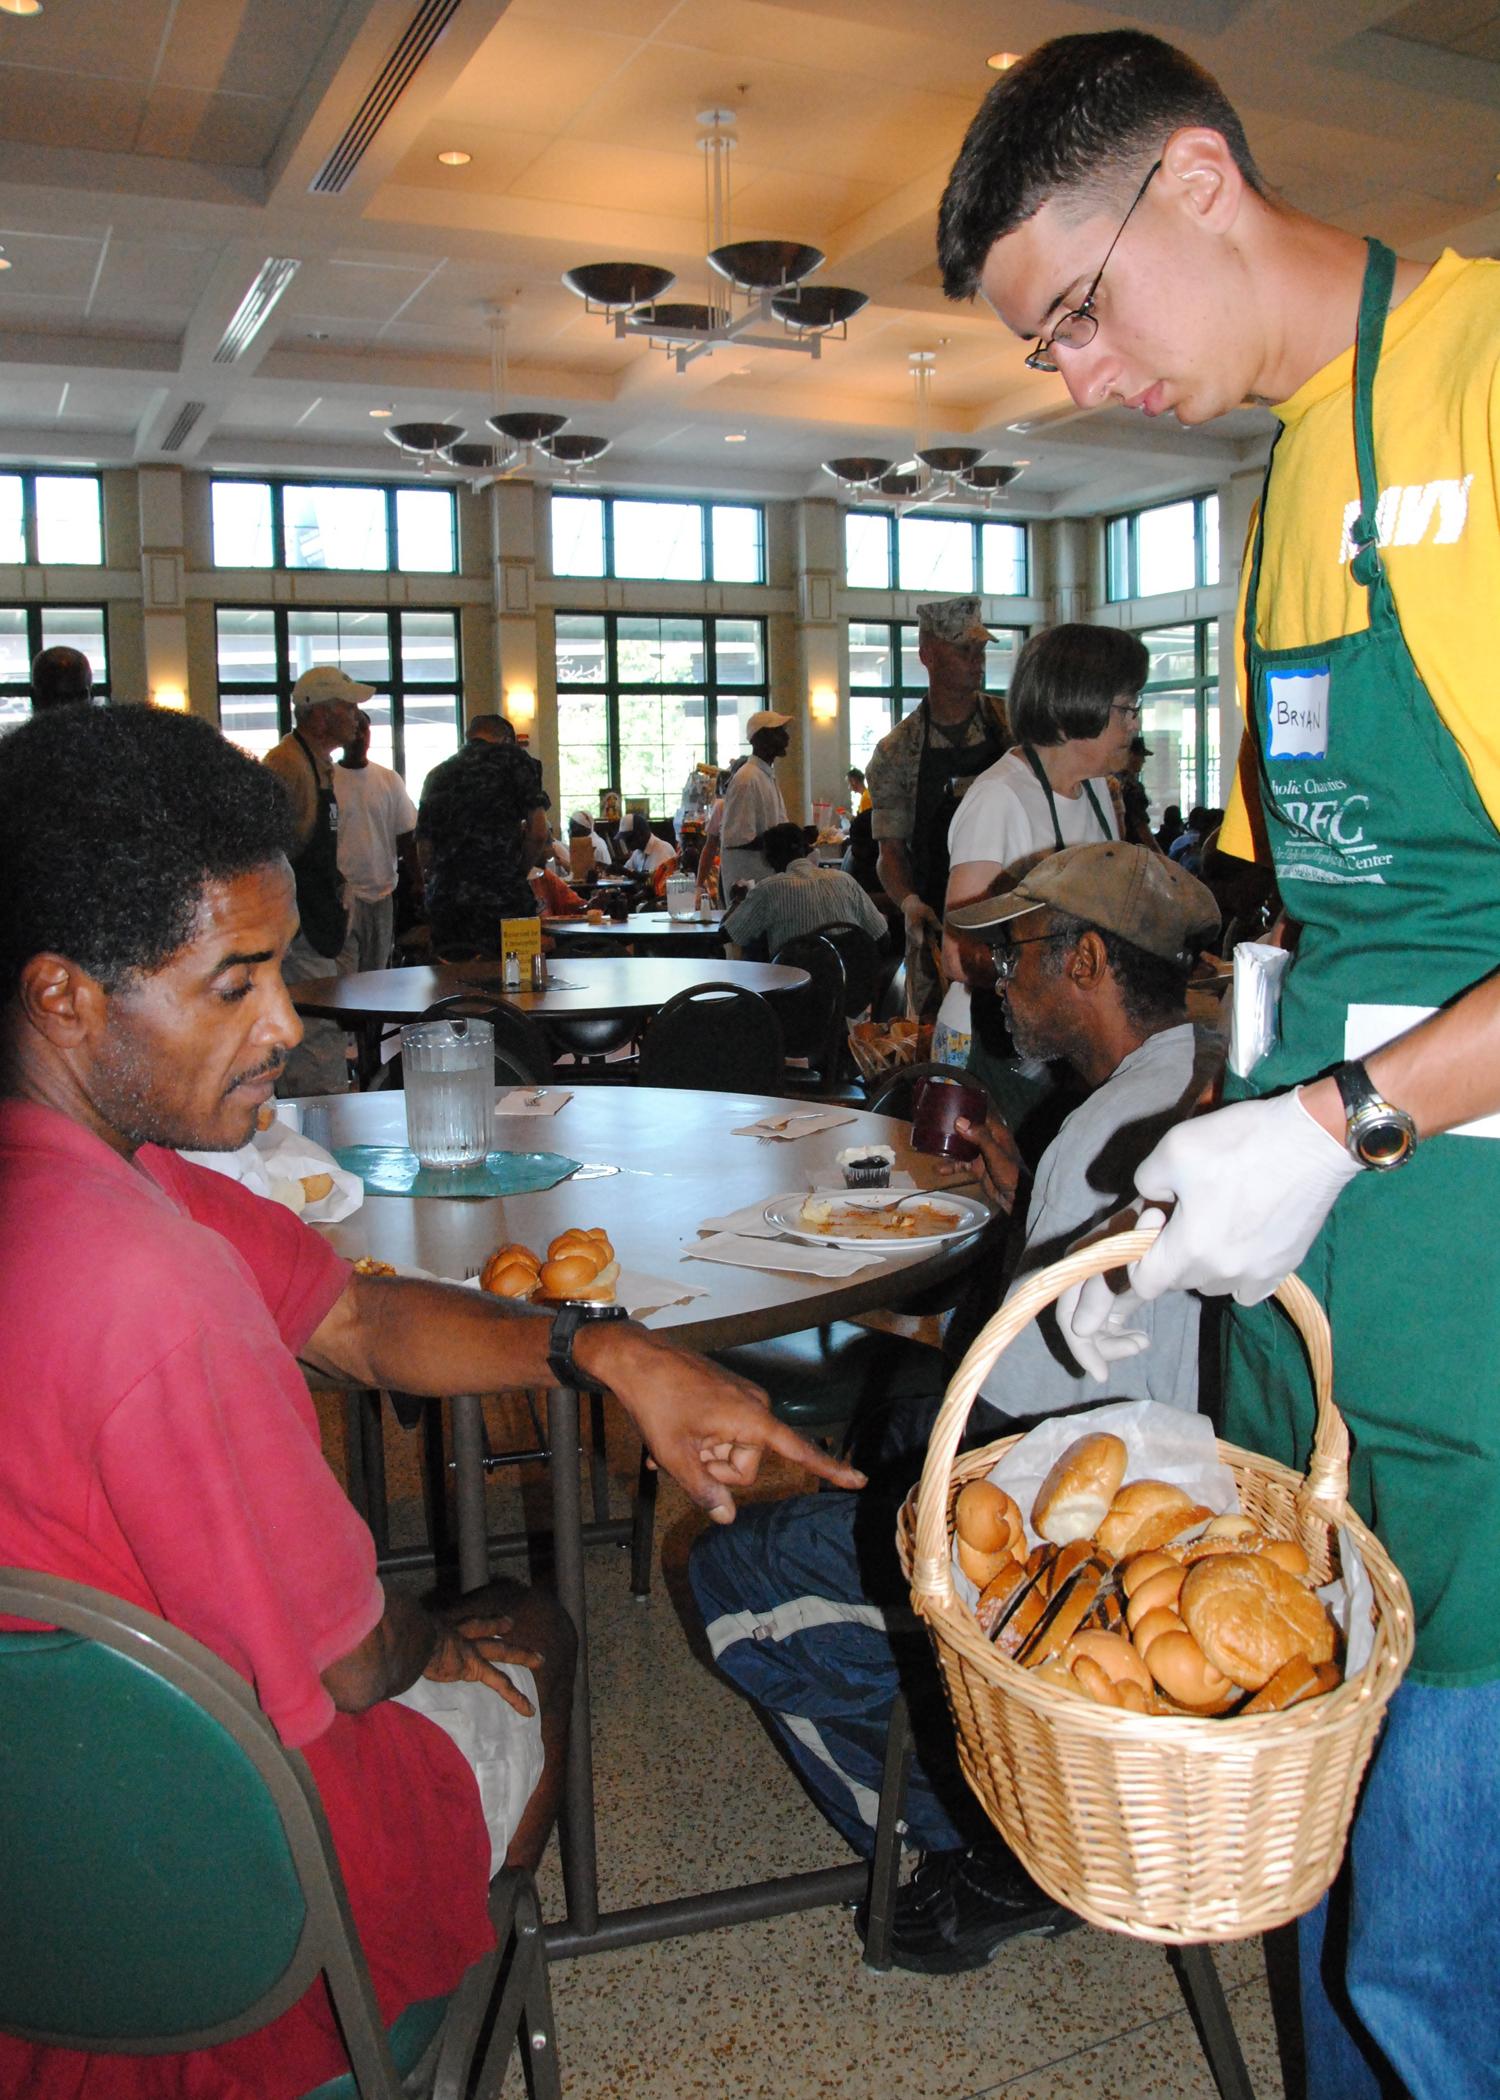 file us navy n 5647h 054 airman bryan pickett serves bread